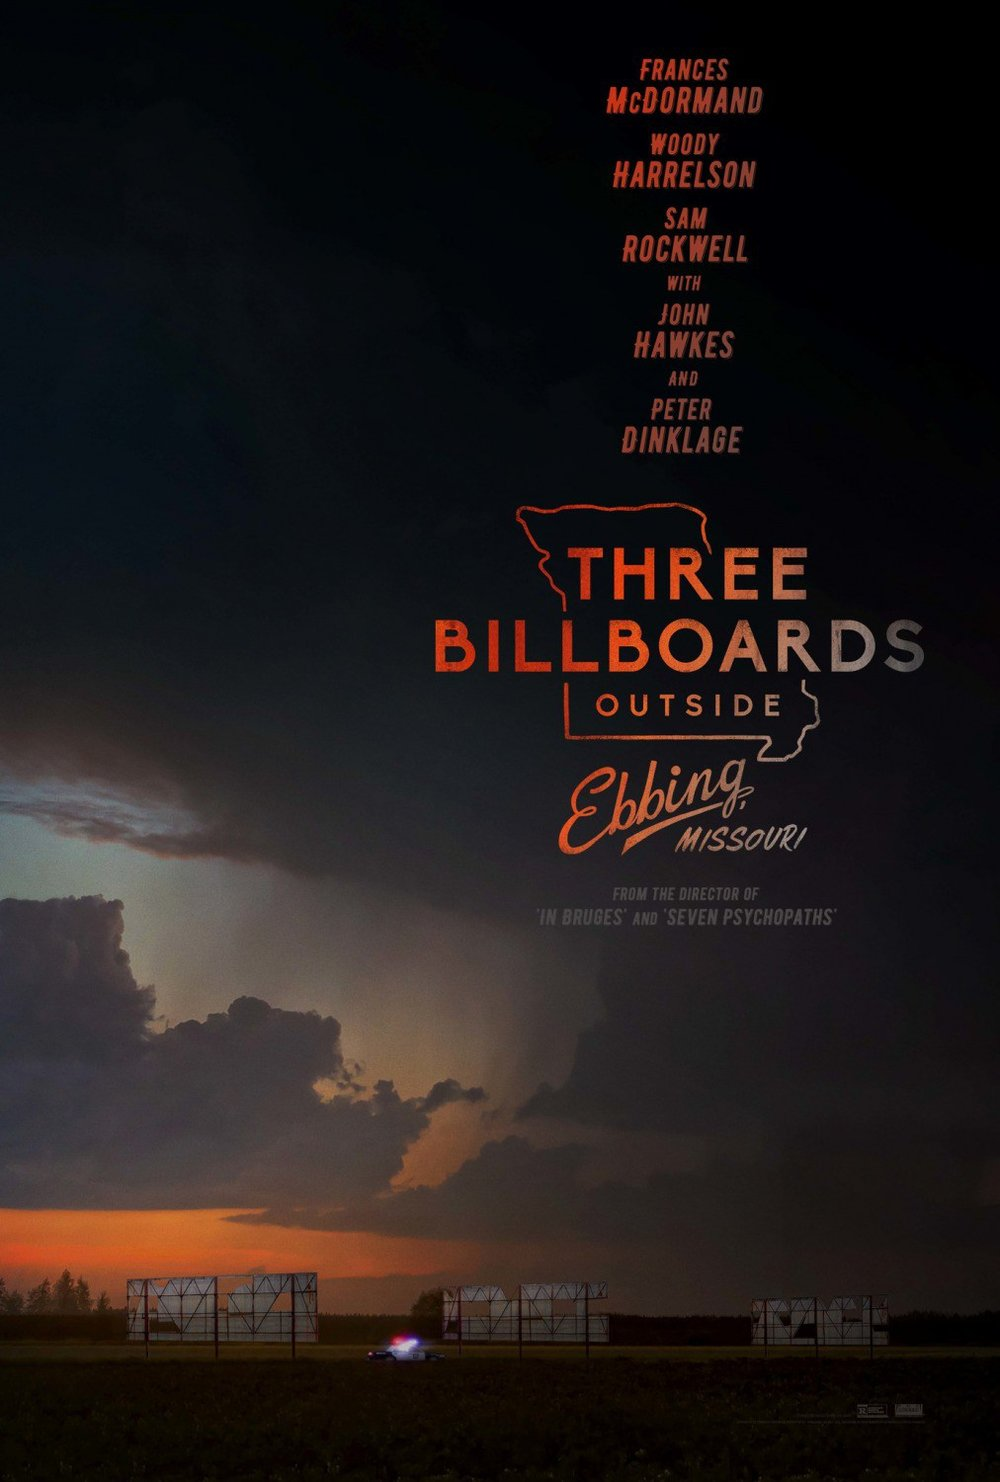 3billboards.jpg